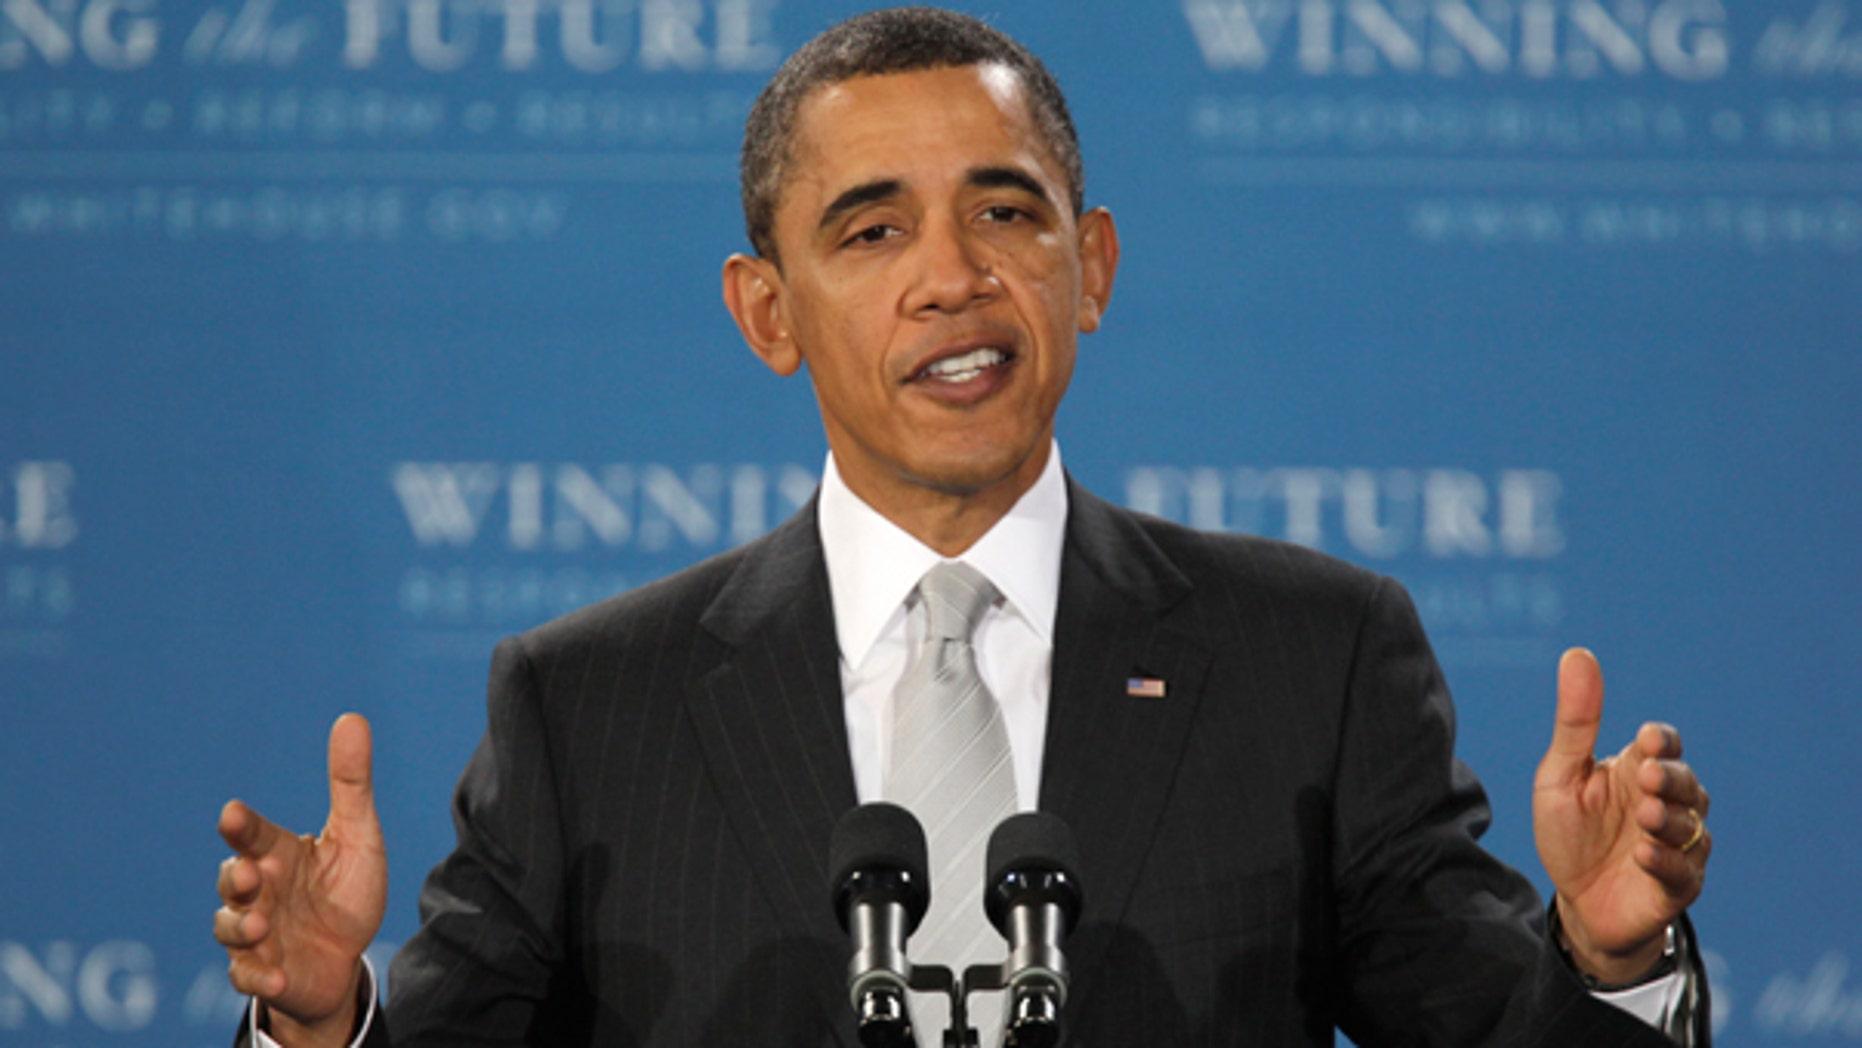 Monday: President Obama speaks at Kenmore Middle School in Arlington, Va.